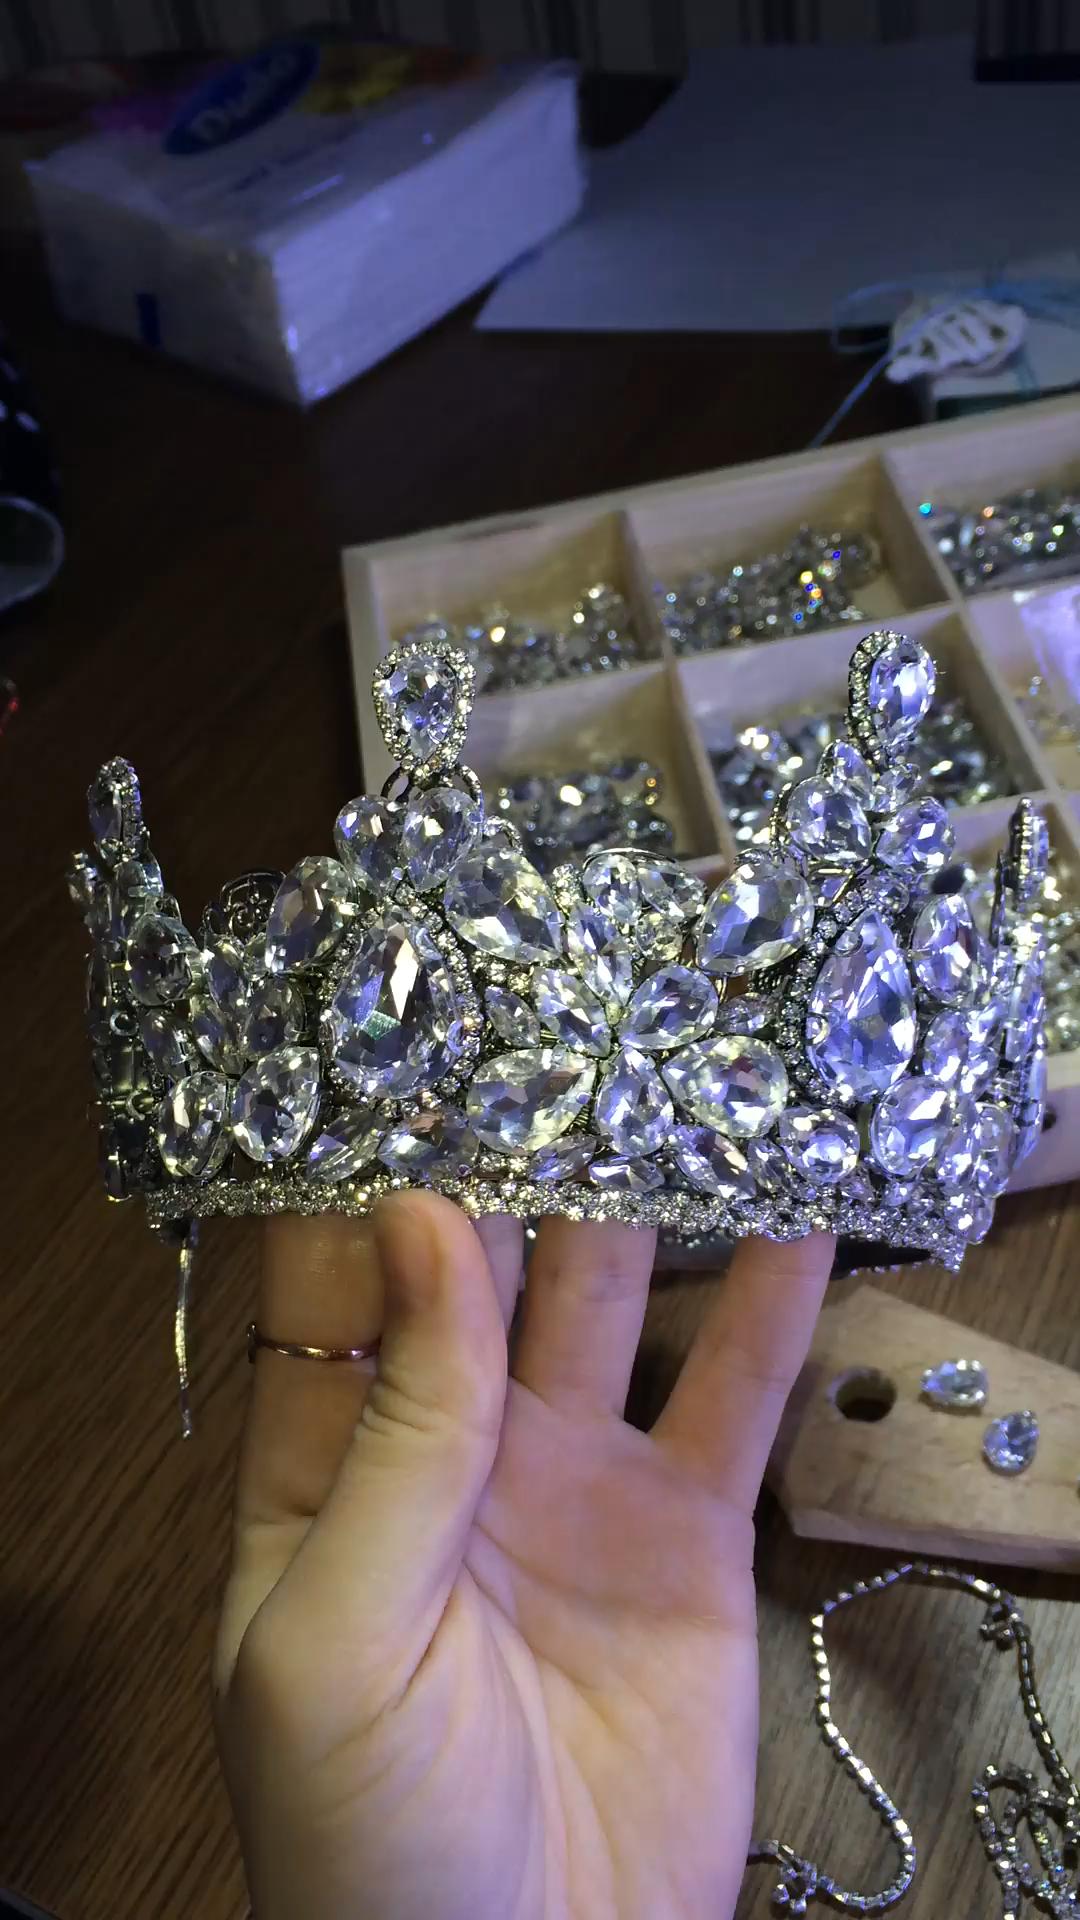 Handmade luxury crystals tiara, Wedding crown, Diadema for bride, Shine tiara, Famous wedding